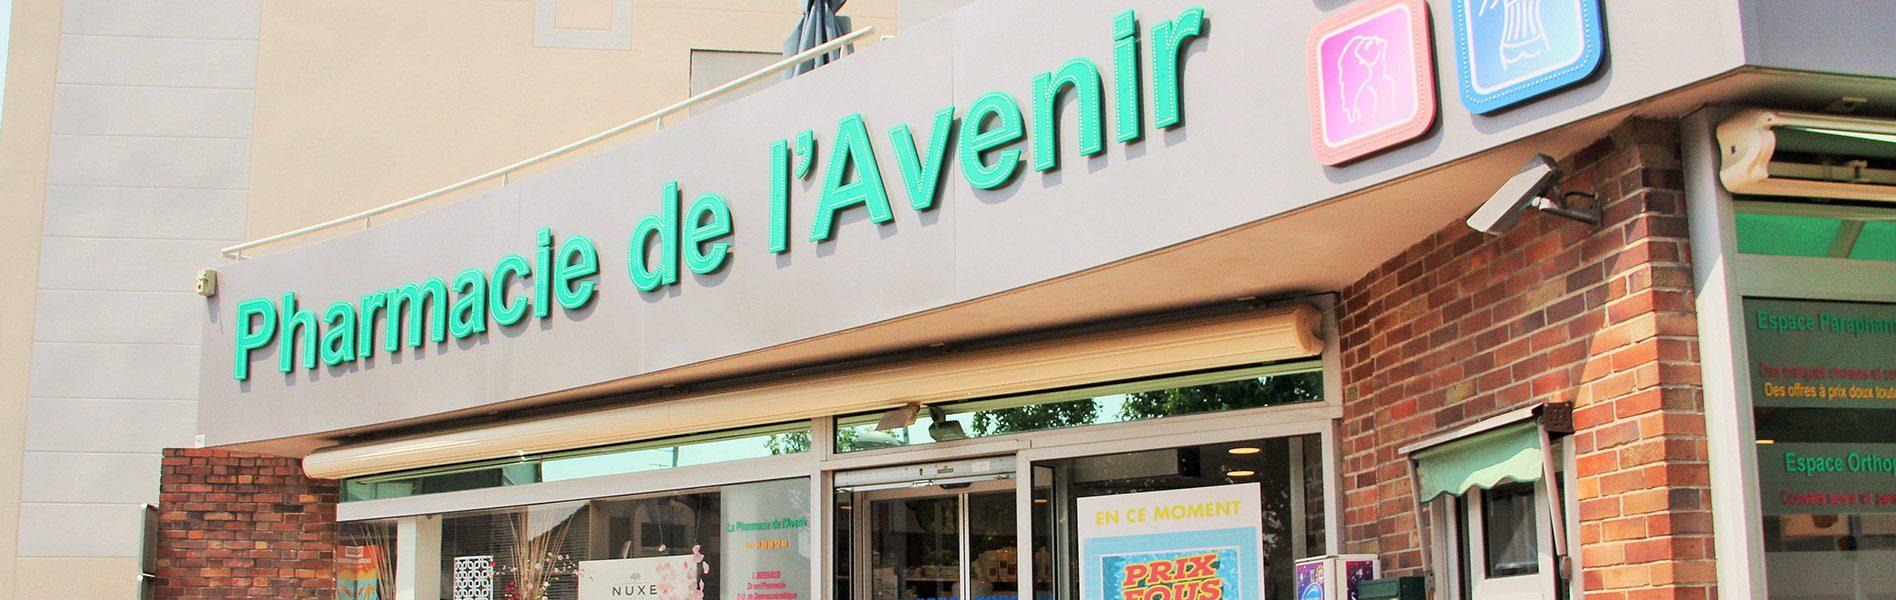 Pharmacie DE L'AVENIR - Image Homepage 2